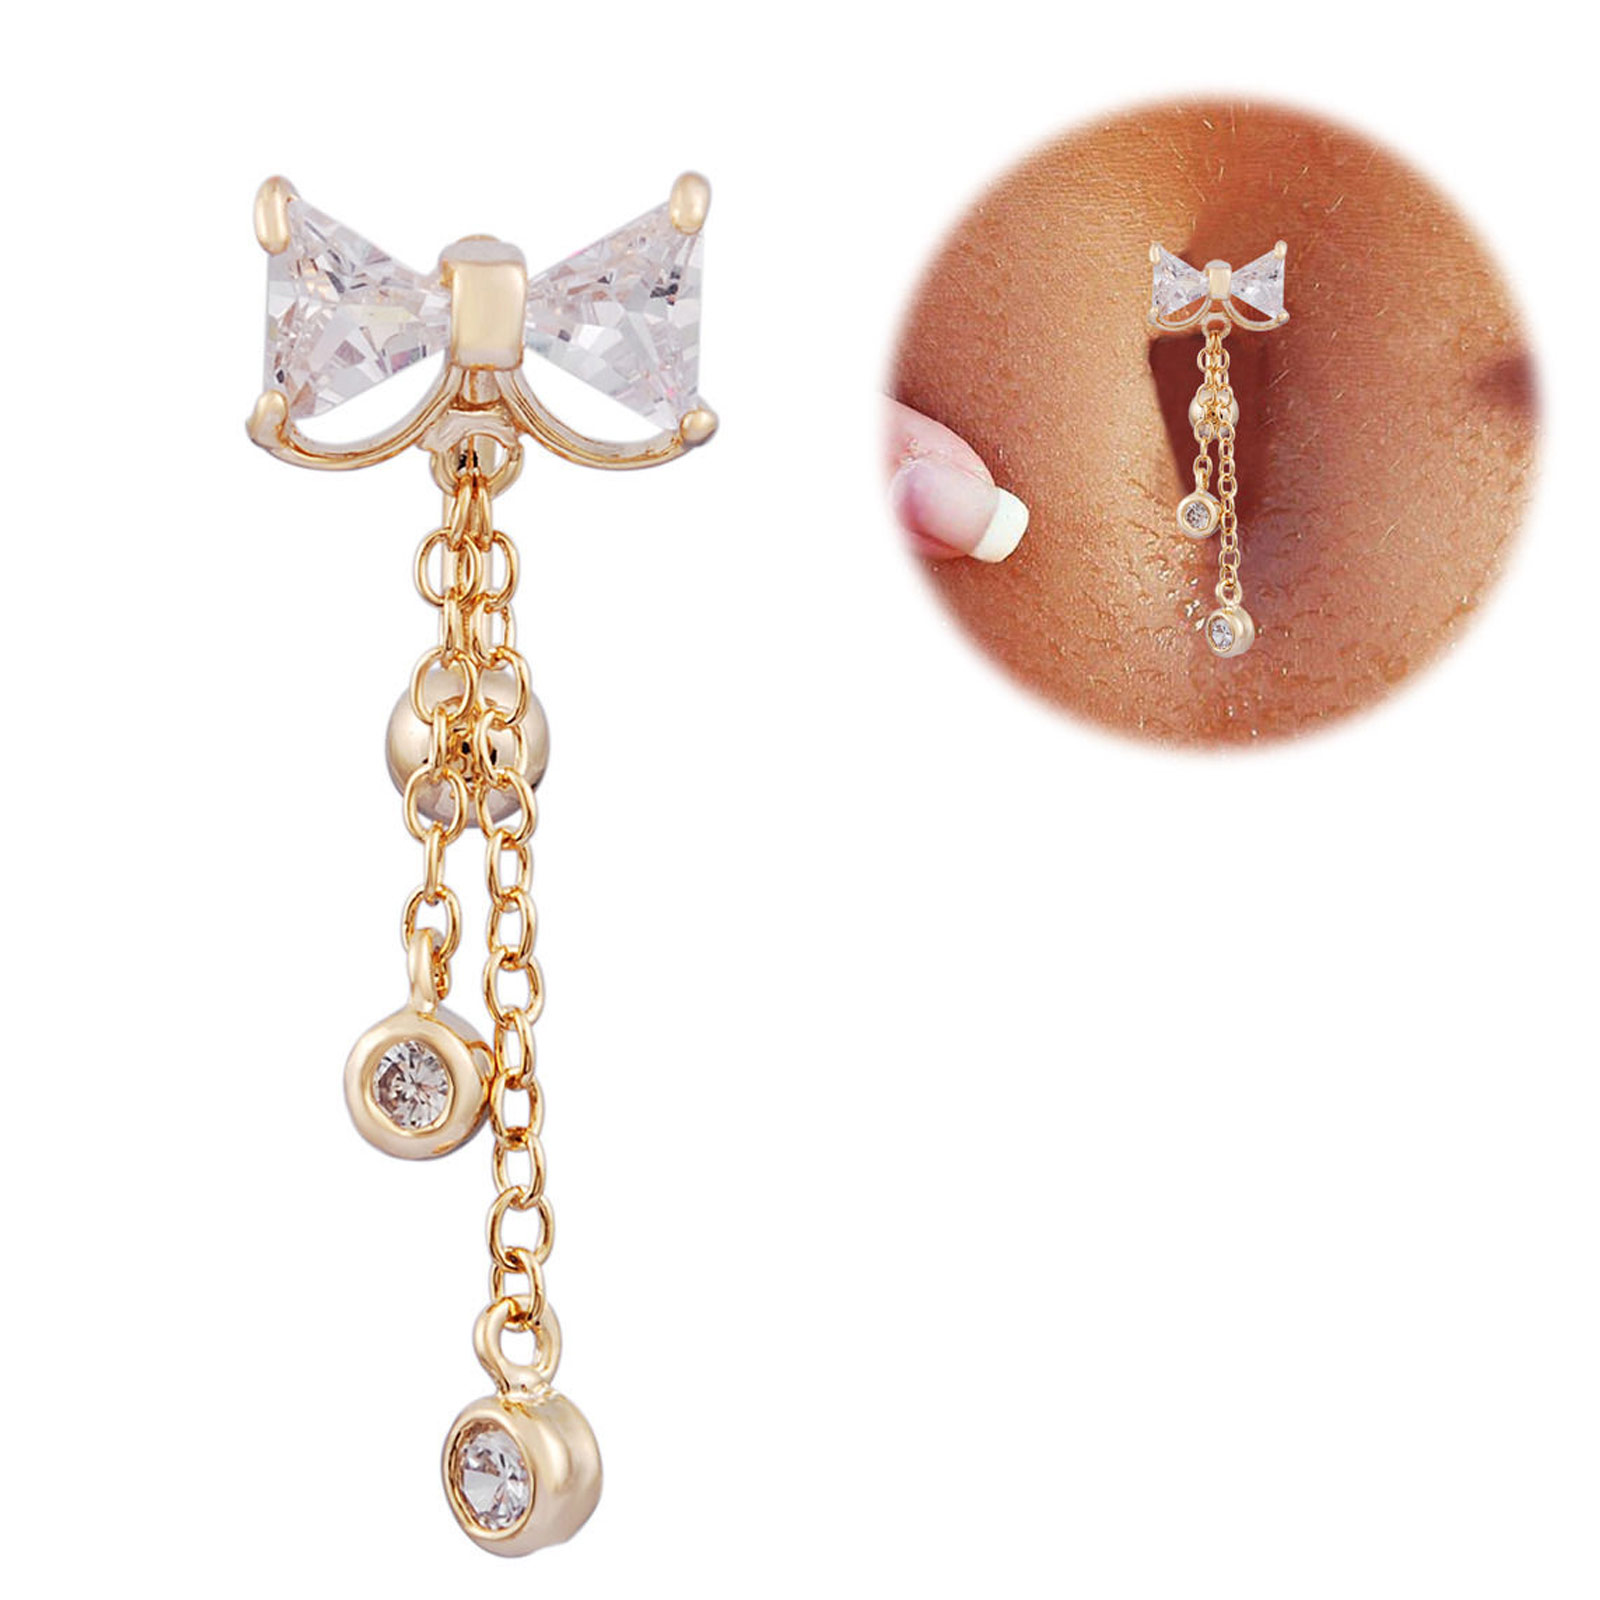 Piercing Jewelry Screws Bodyjewellery 18g 18 Gauge 1mm Clear